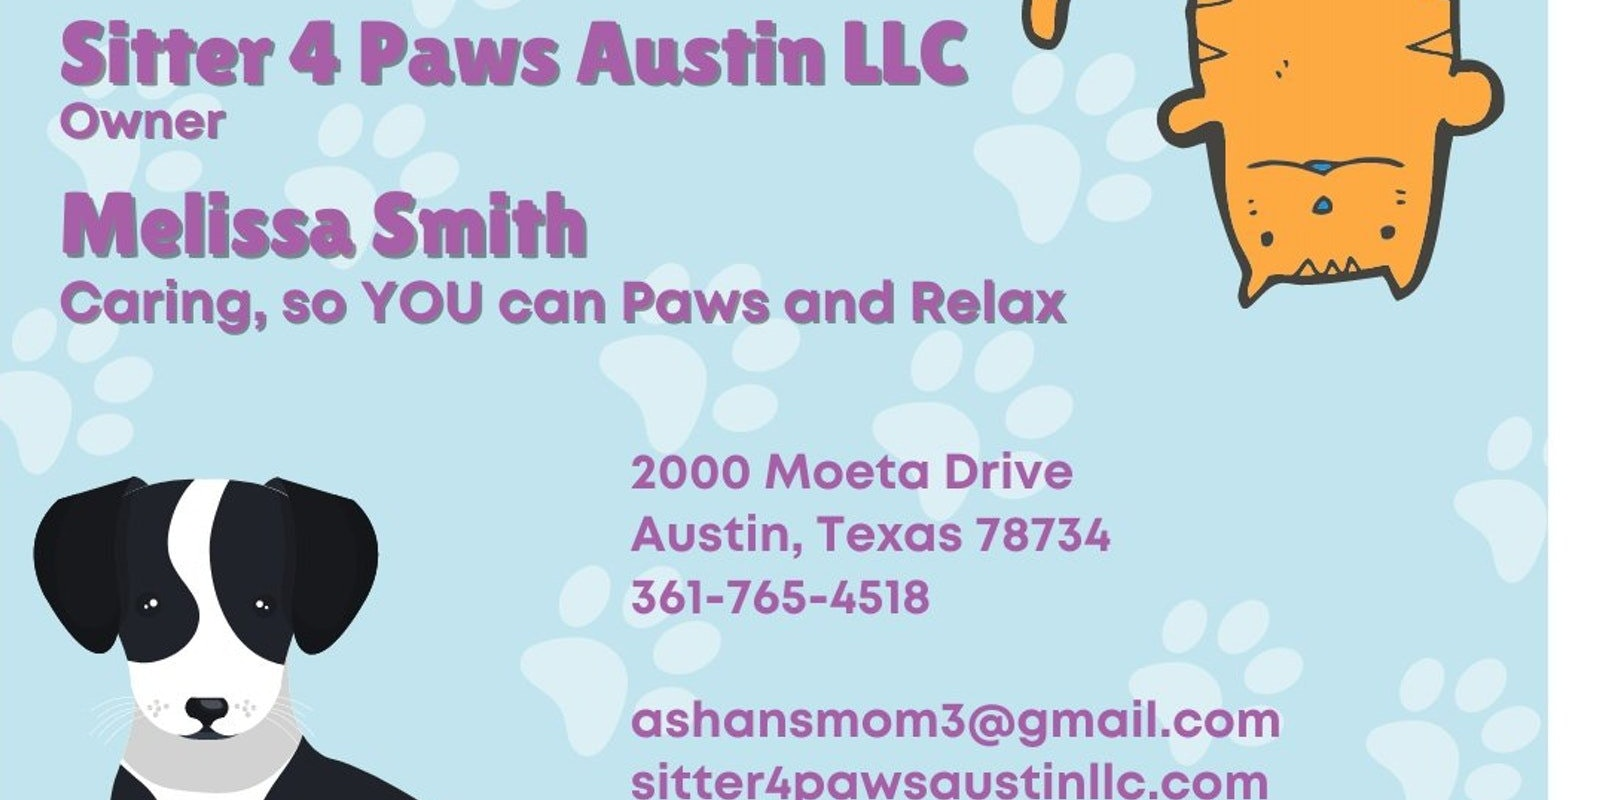 Sitter 4 Paws Austin LLC